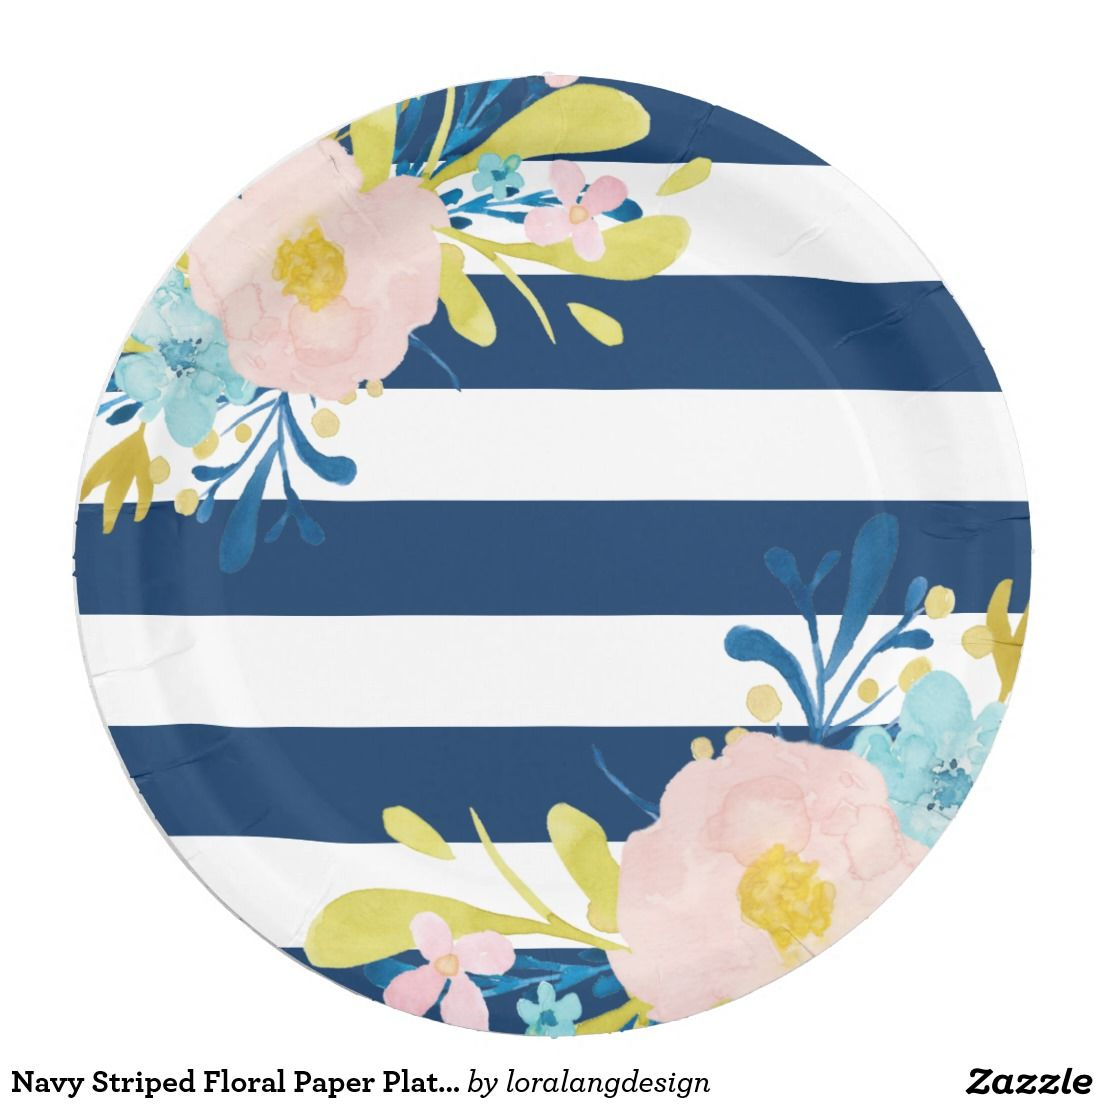 sc 1 st  Pinterest & Navy Striped Floral Paper Plates